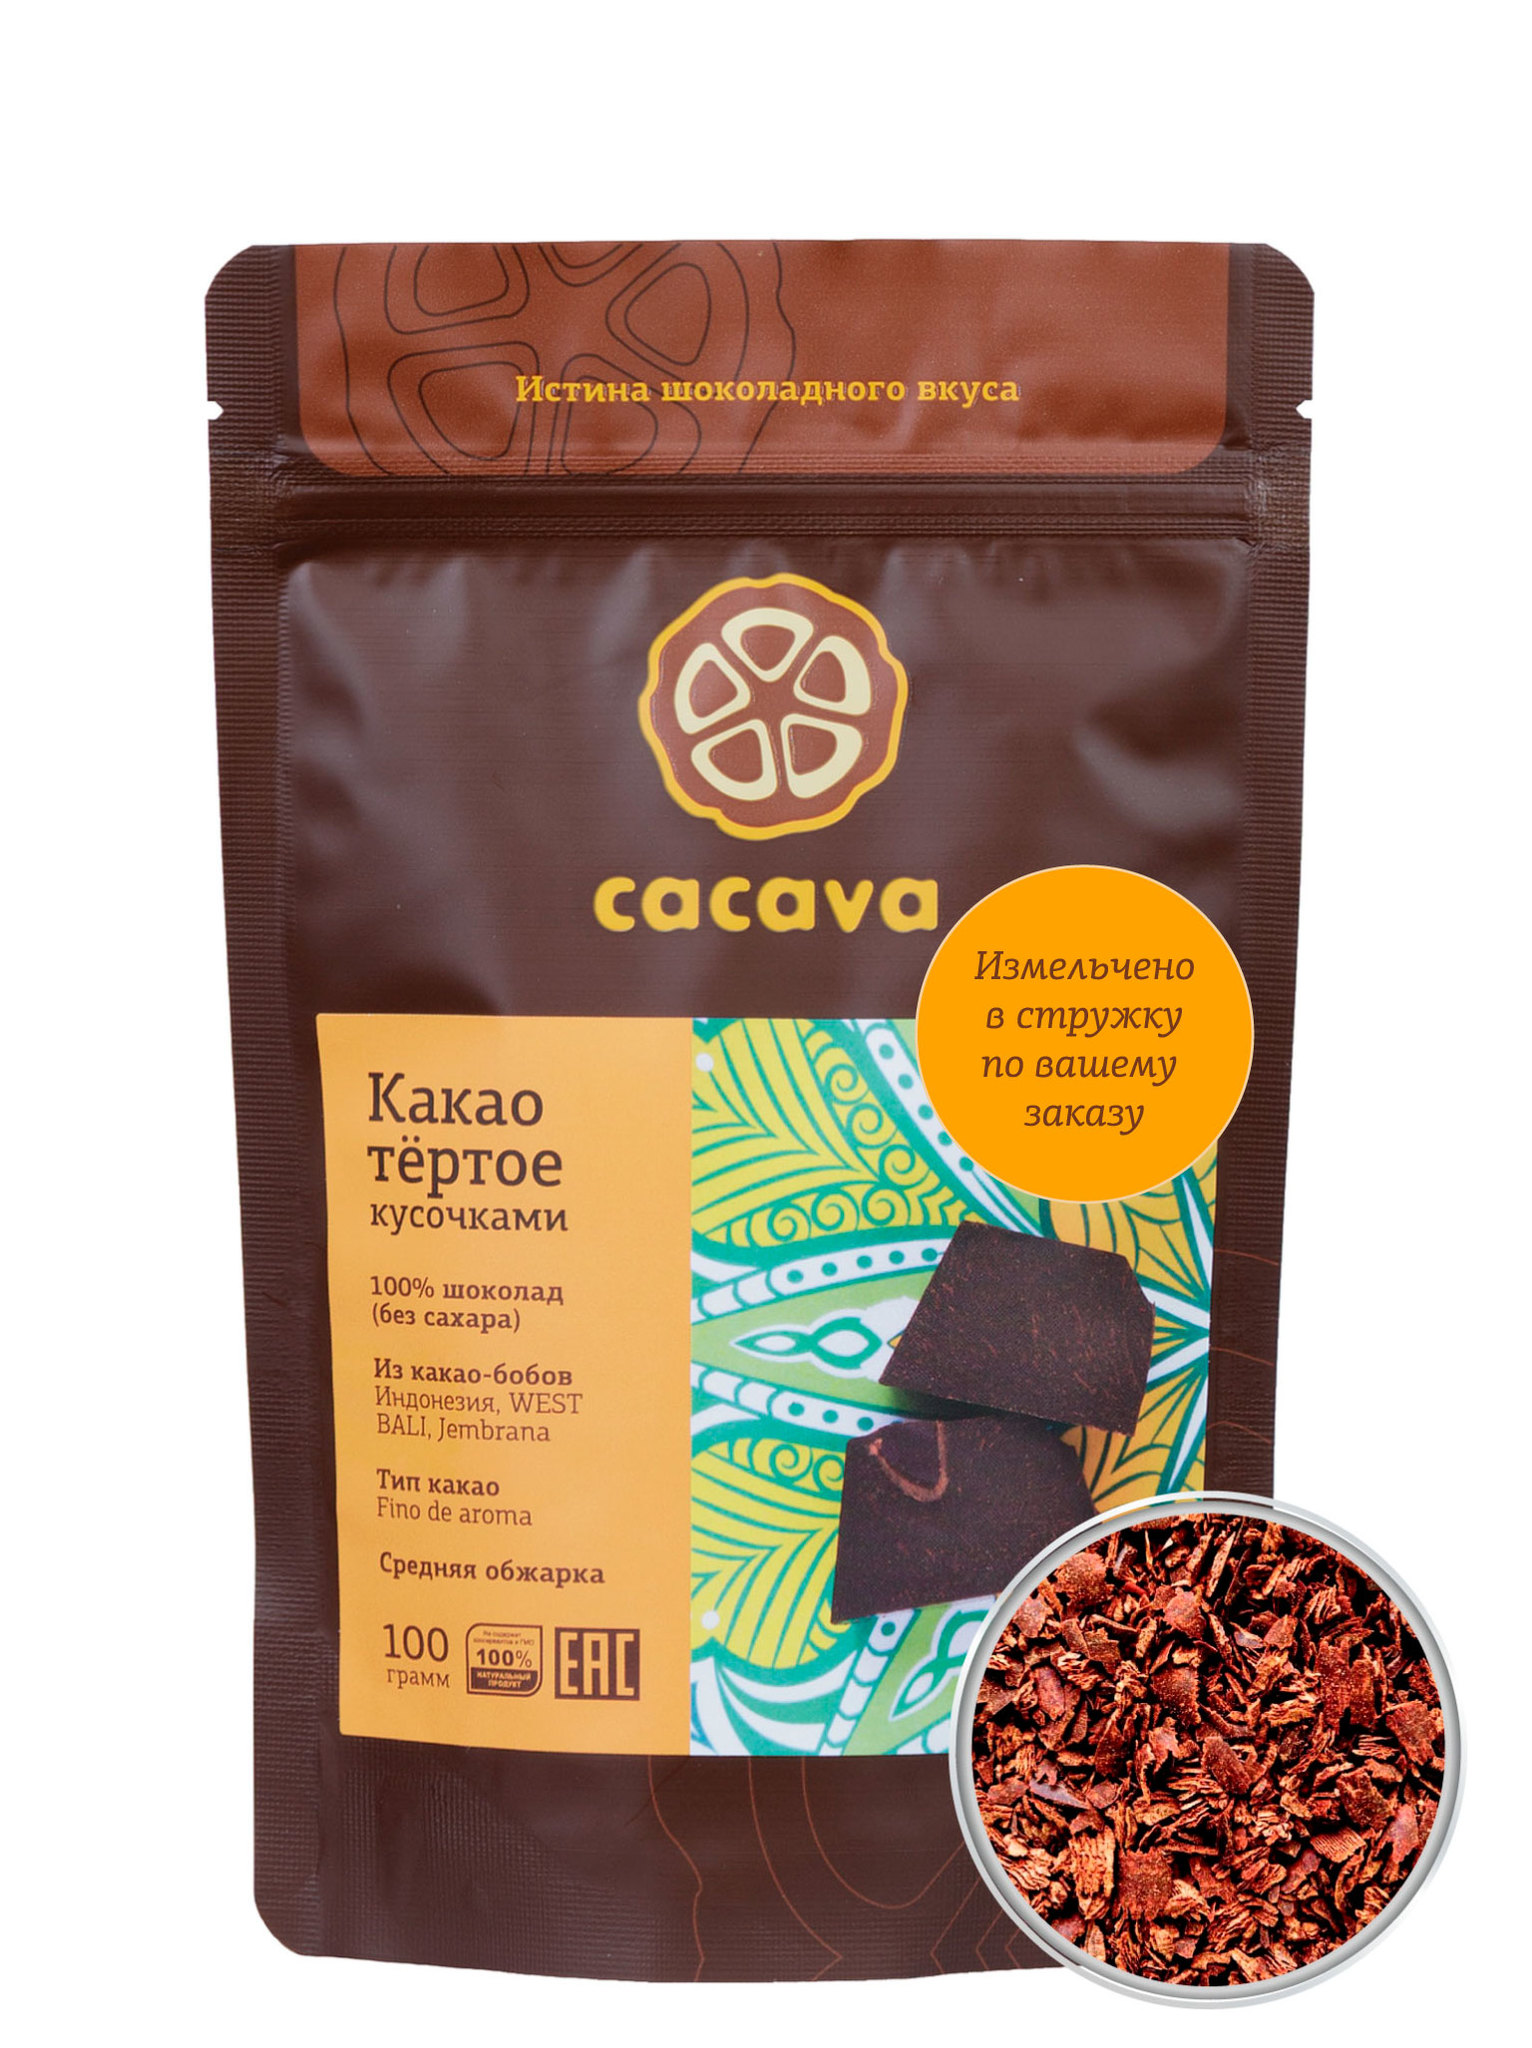 Какао тёртое в стружке (Индонезия, WEST BALI, Jembrana), упаковка 100 грамм